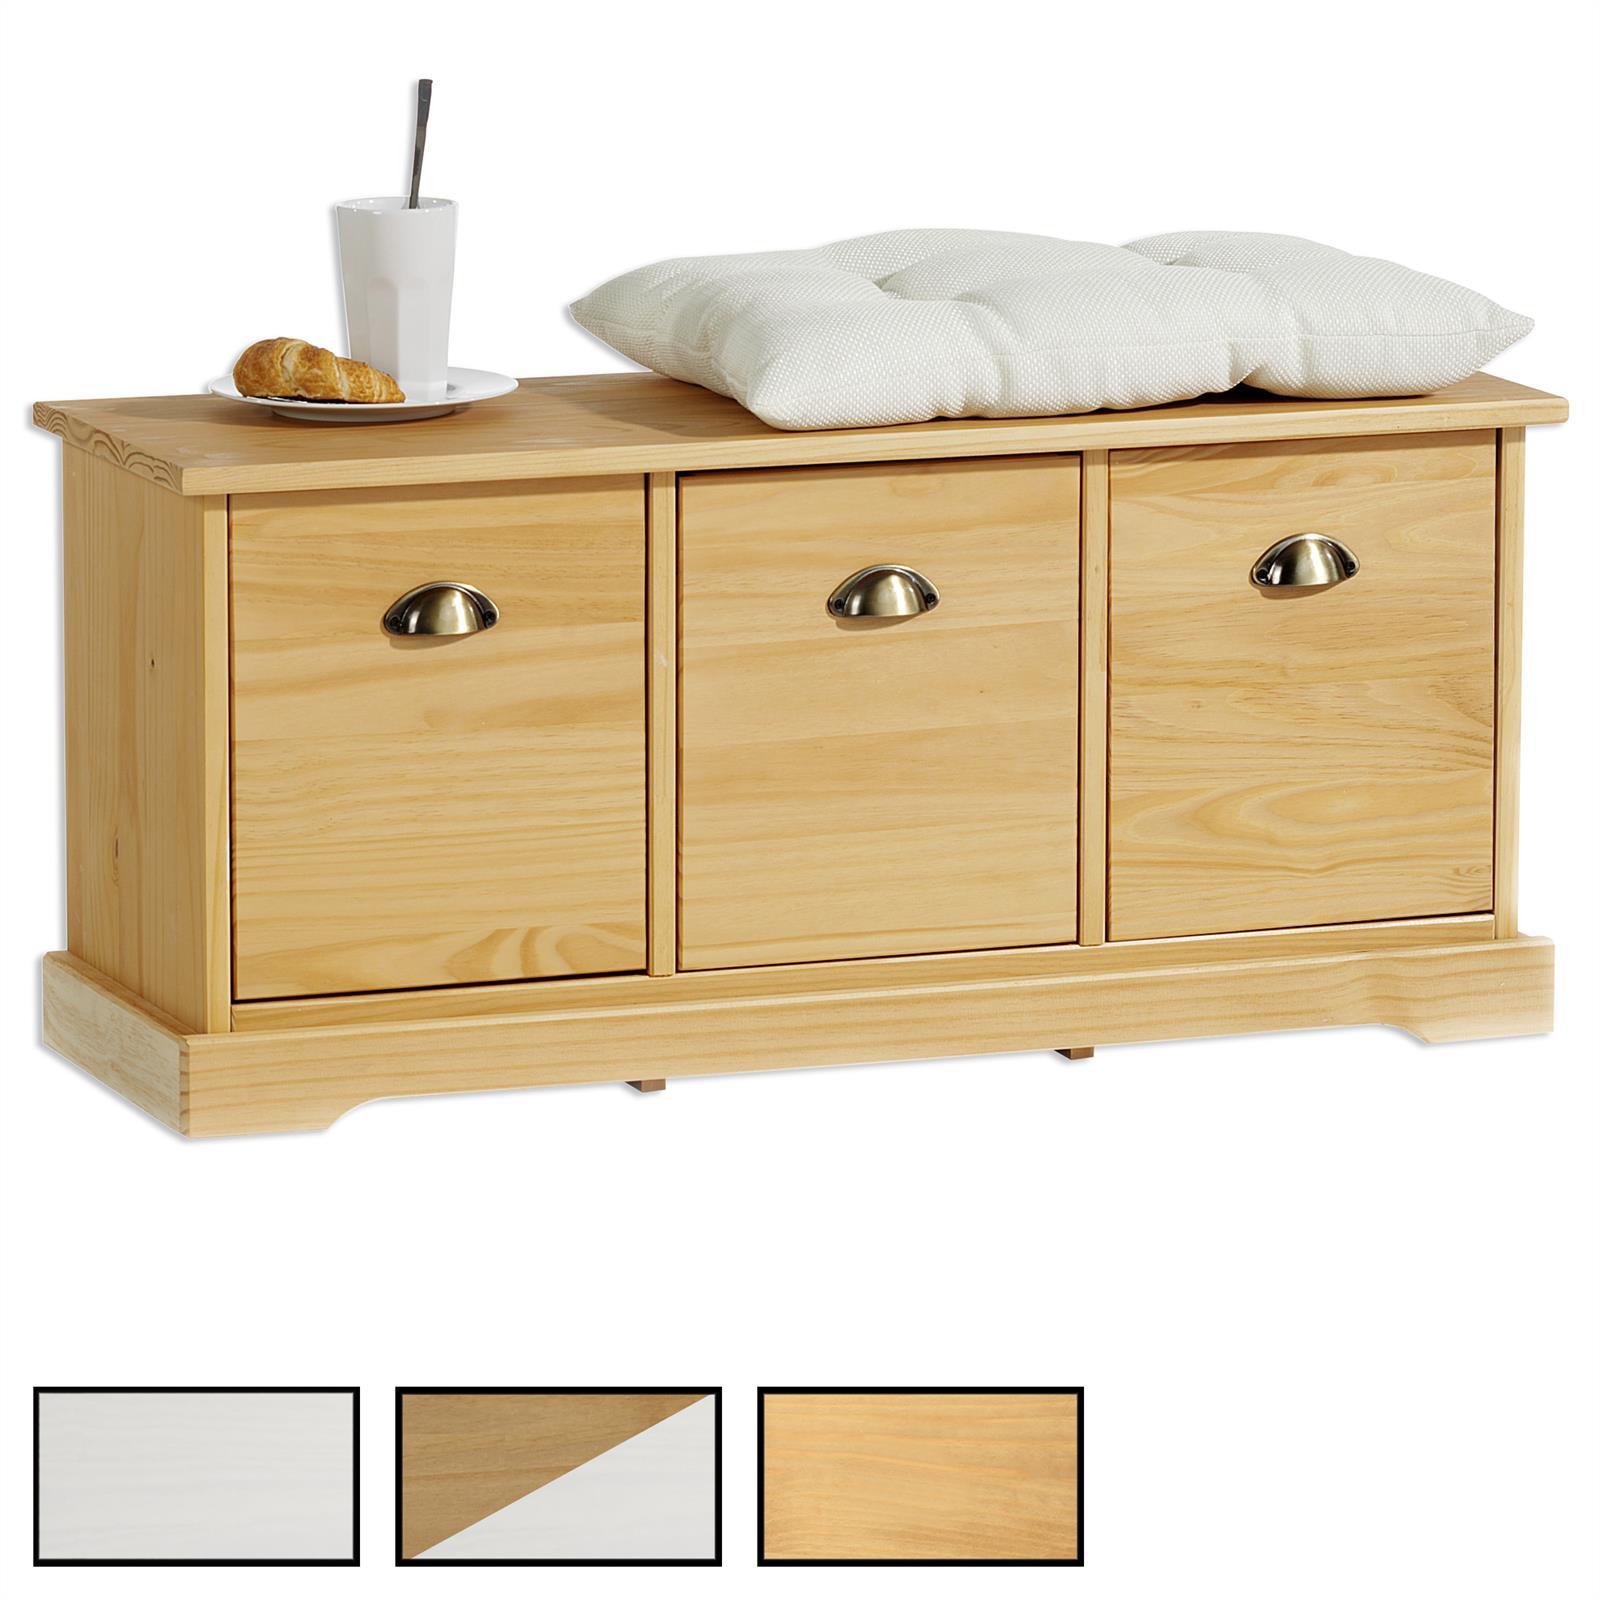 sitzbank nancy mit 3 schubladen in 3 farben mobilia24. Black Bedroom Furniture Sets. Home Design Ideas